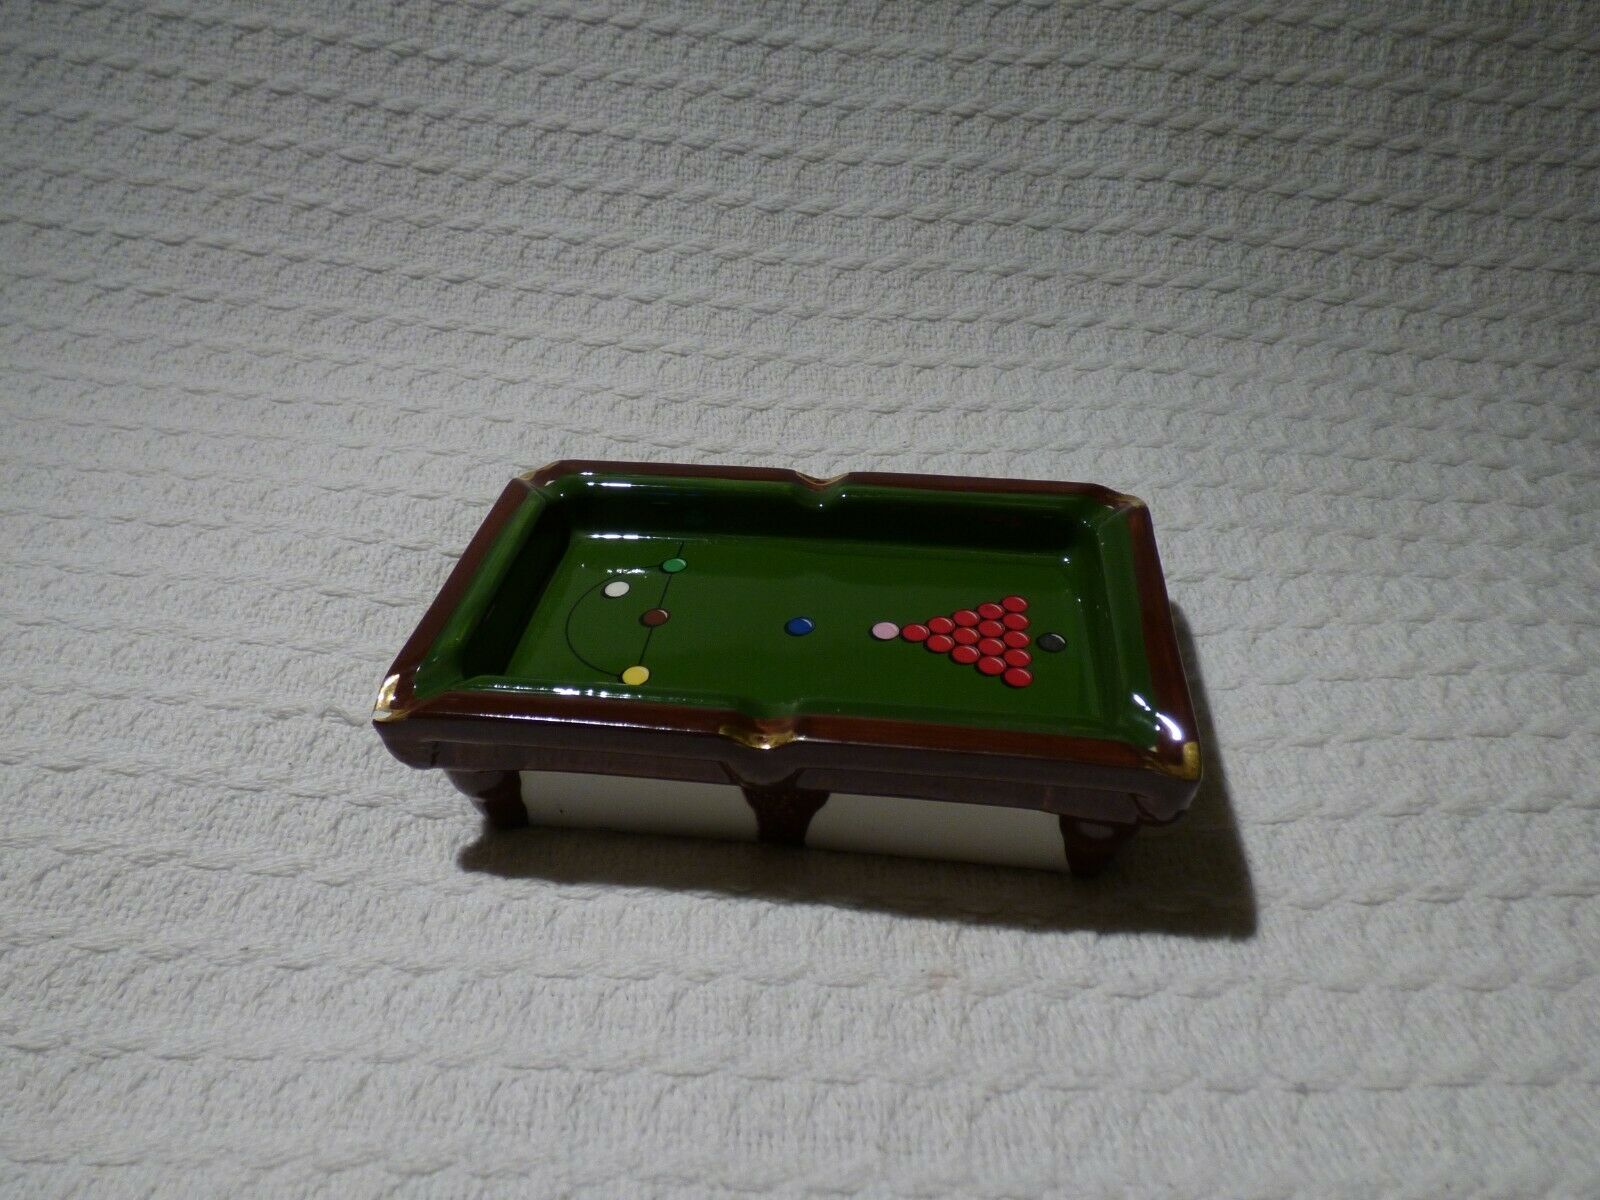 Embassy World Snooker Championship Ceramic Ashtray Ltd Edition